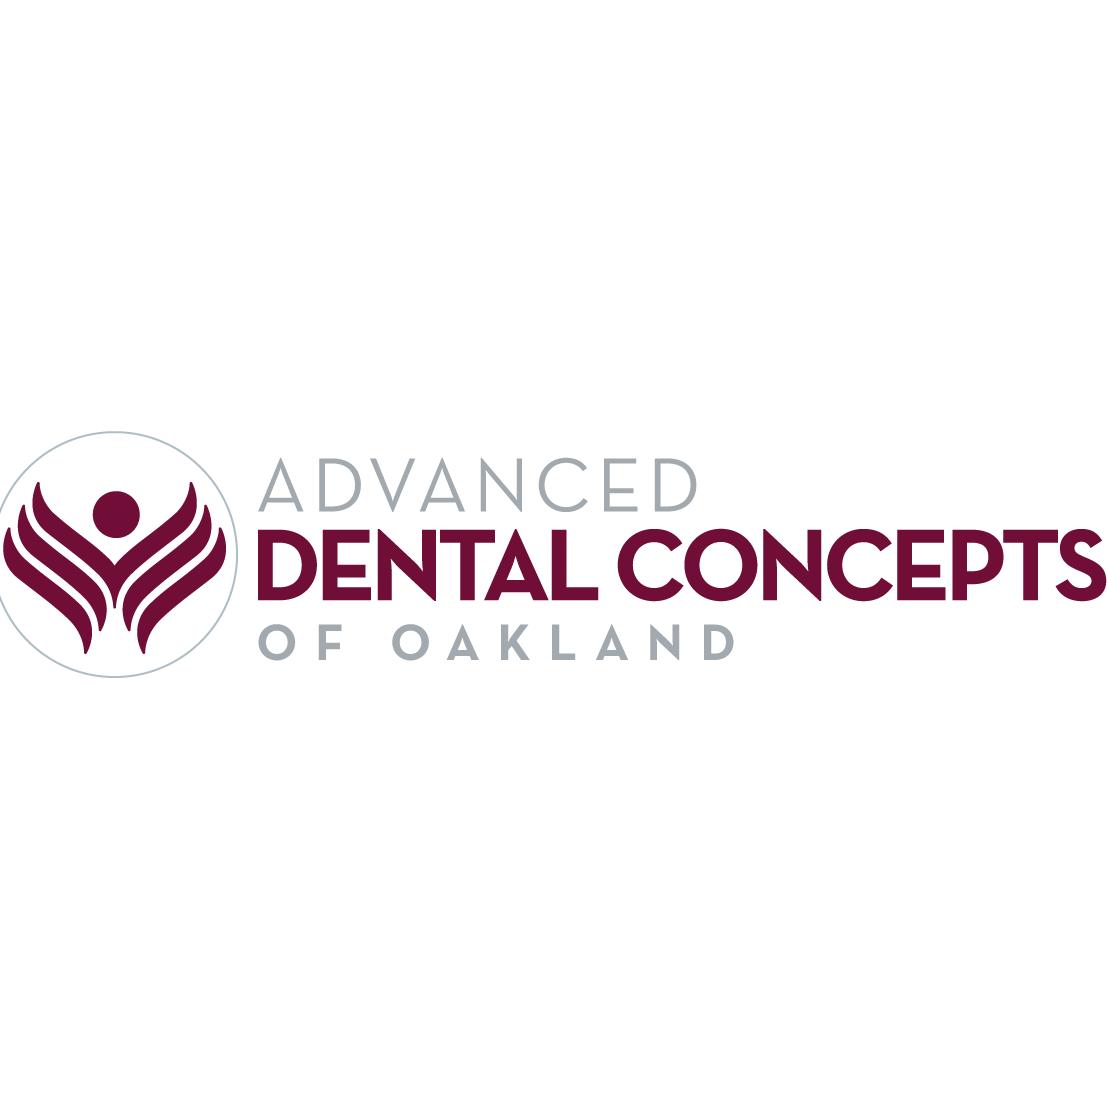 Advanced Dental Concepts of Oakland - Oakland, CA - Dentists & Dental Services